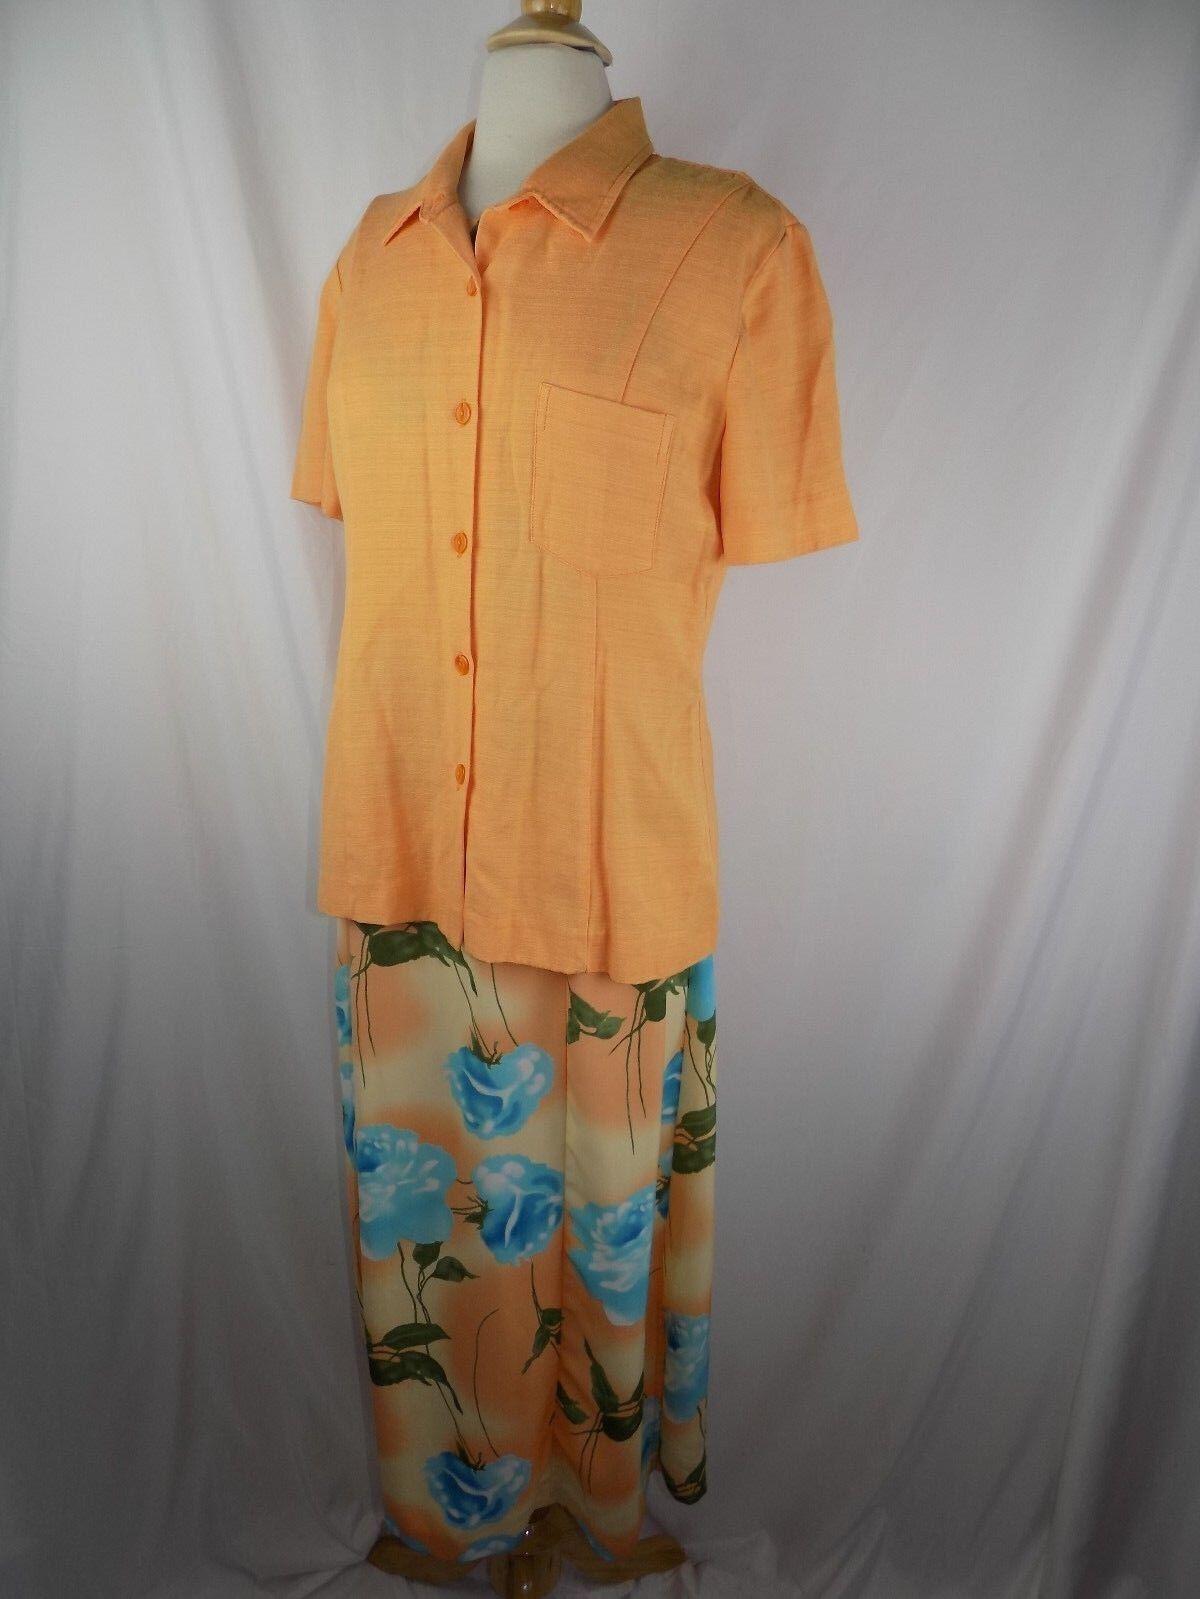 Kaktus Women's Size Medium 2 pc orange Floral Dress & Button Shirt Top